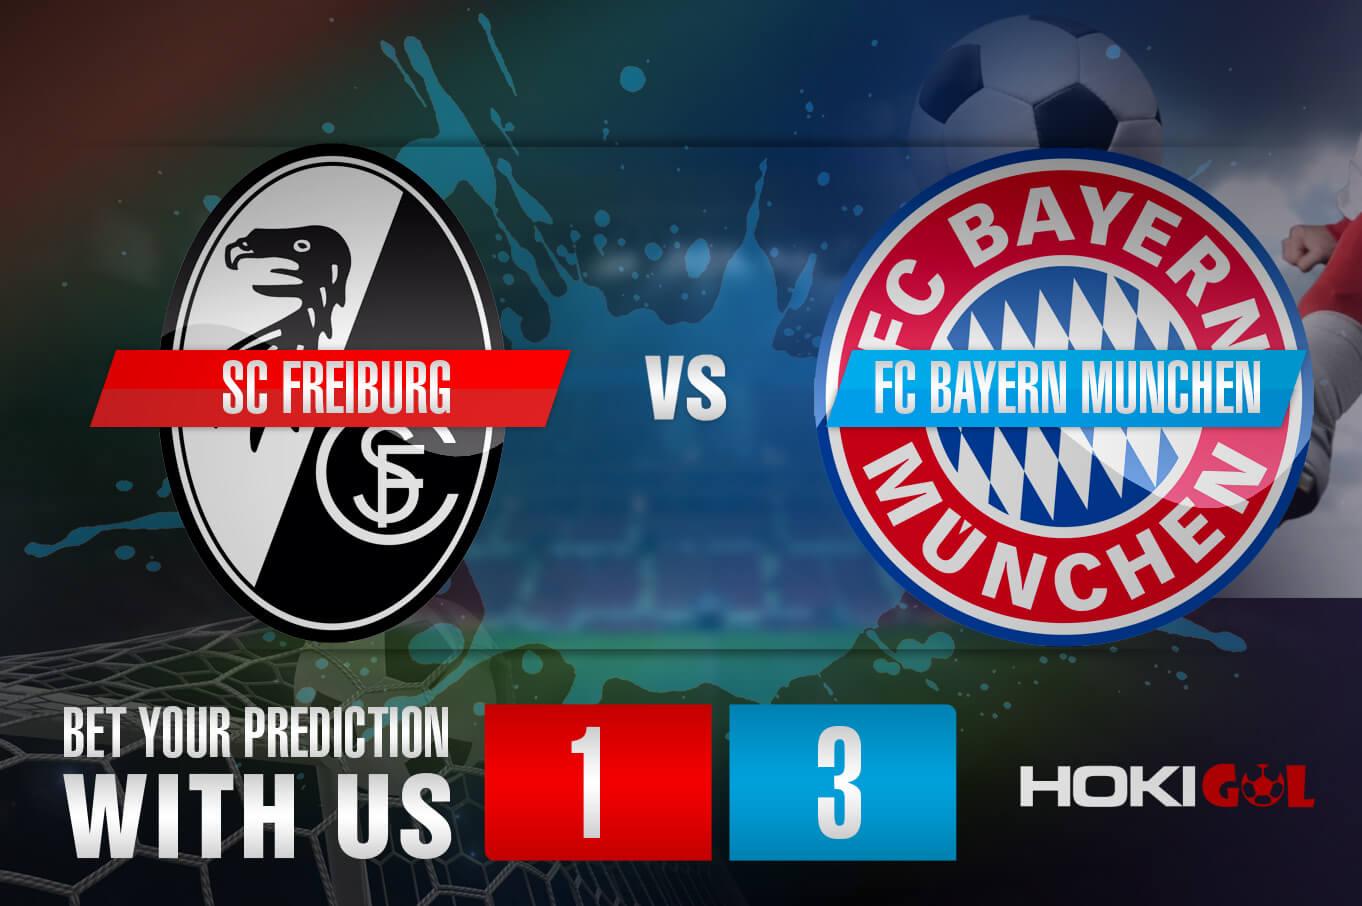 Prediksi Bola SC Freiburg Vs FC Bayern Munchen 15 Mei 2021